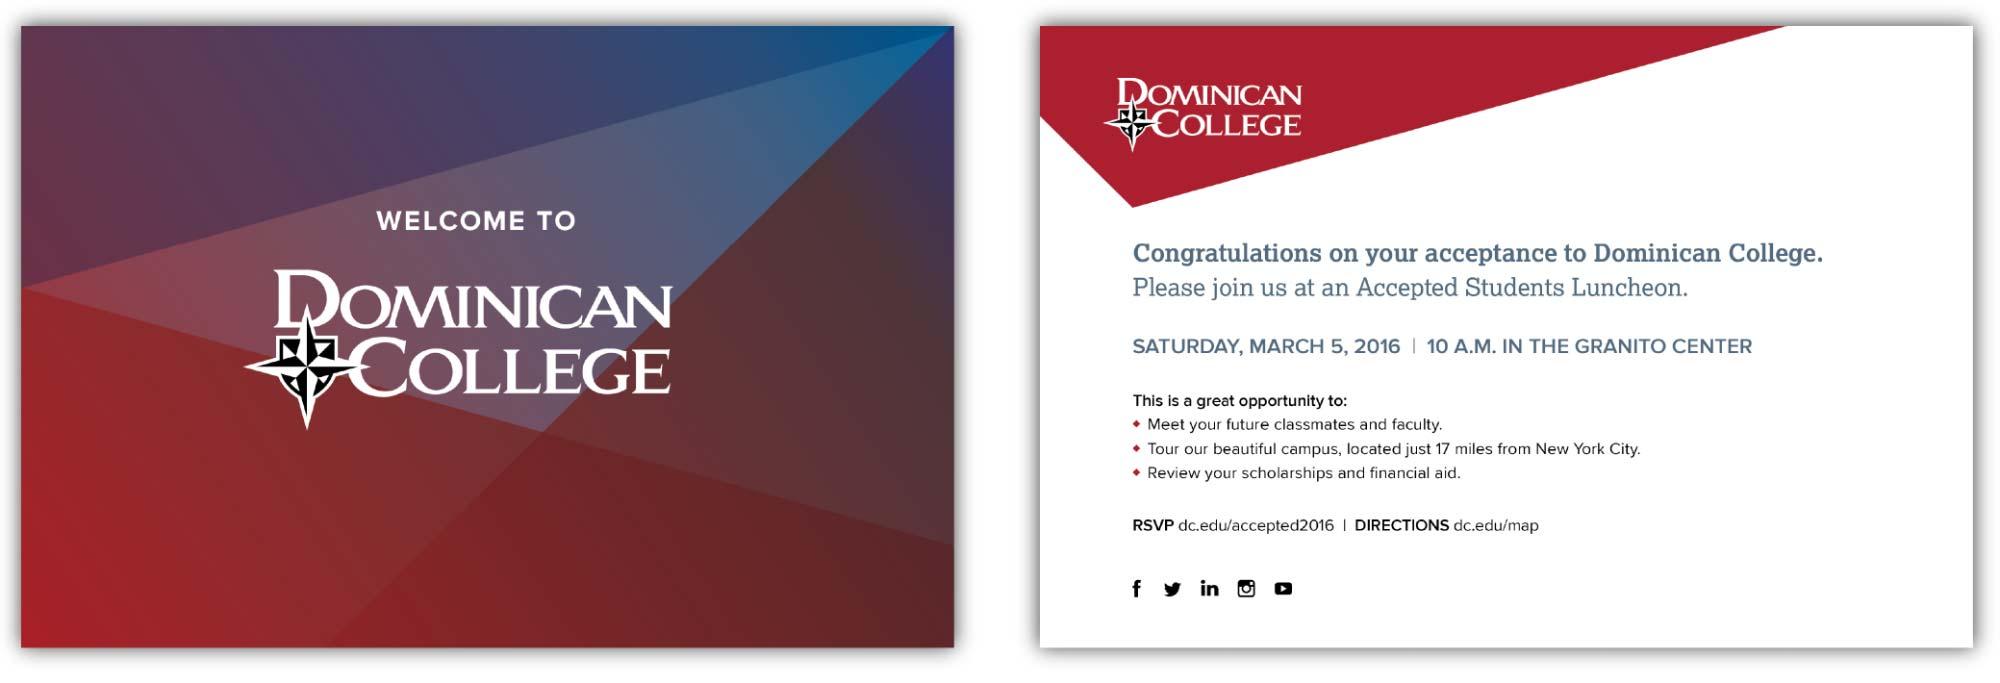 Domician College Acceptance Postcard Mockup